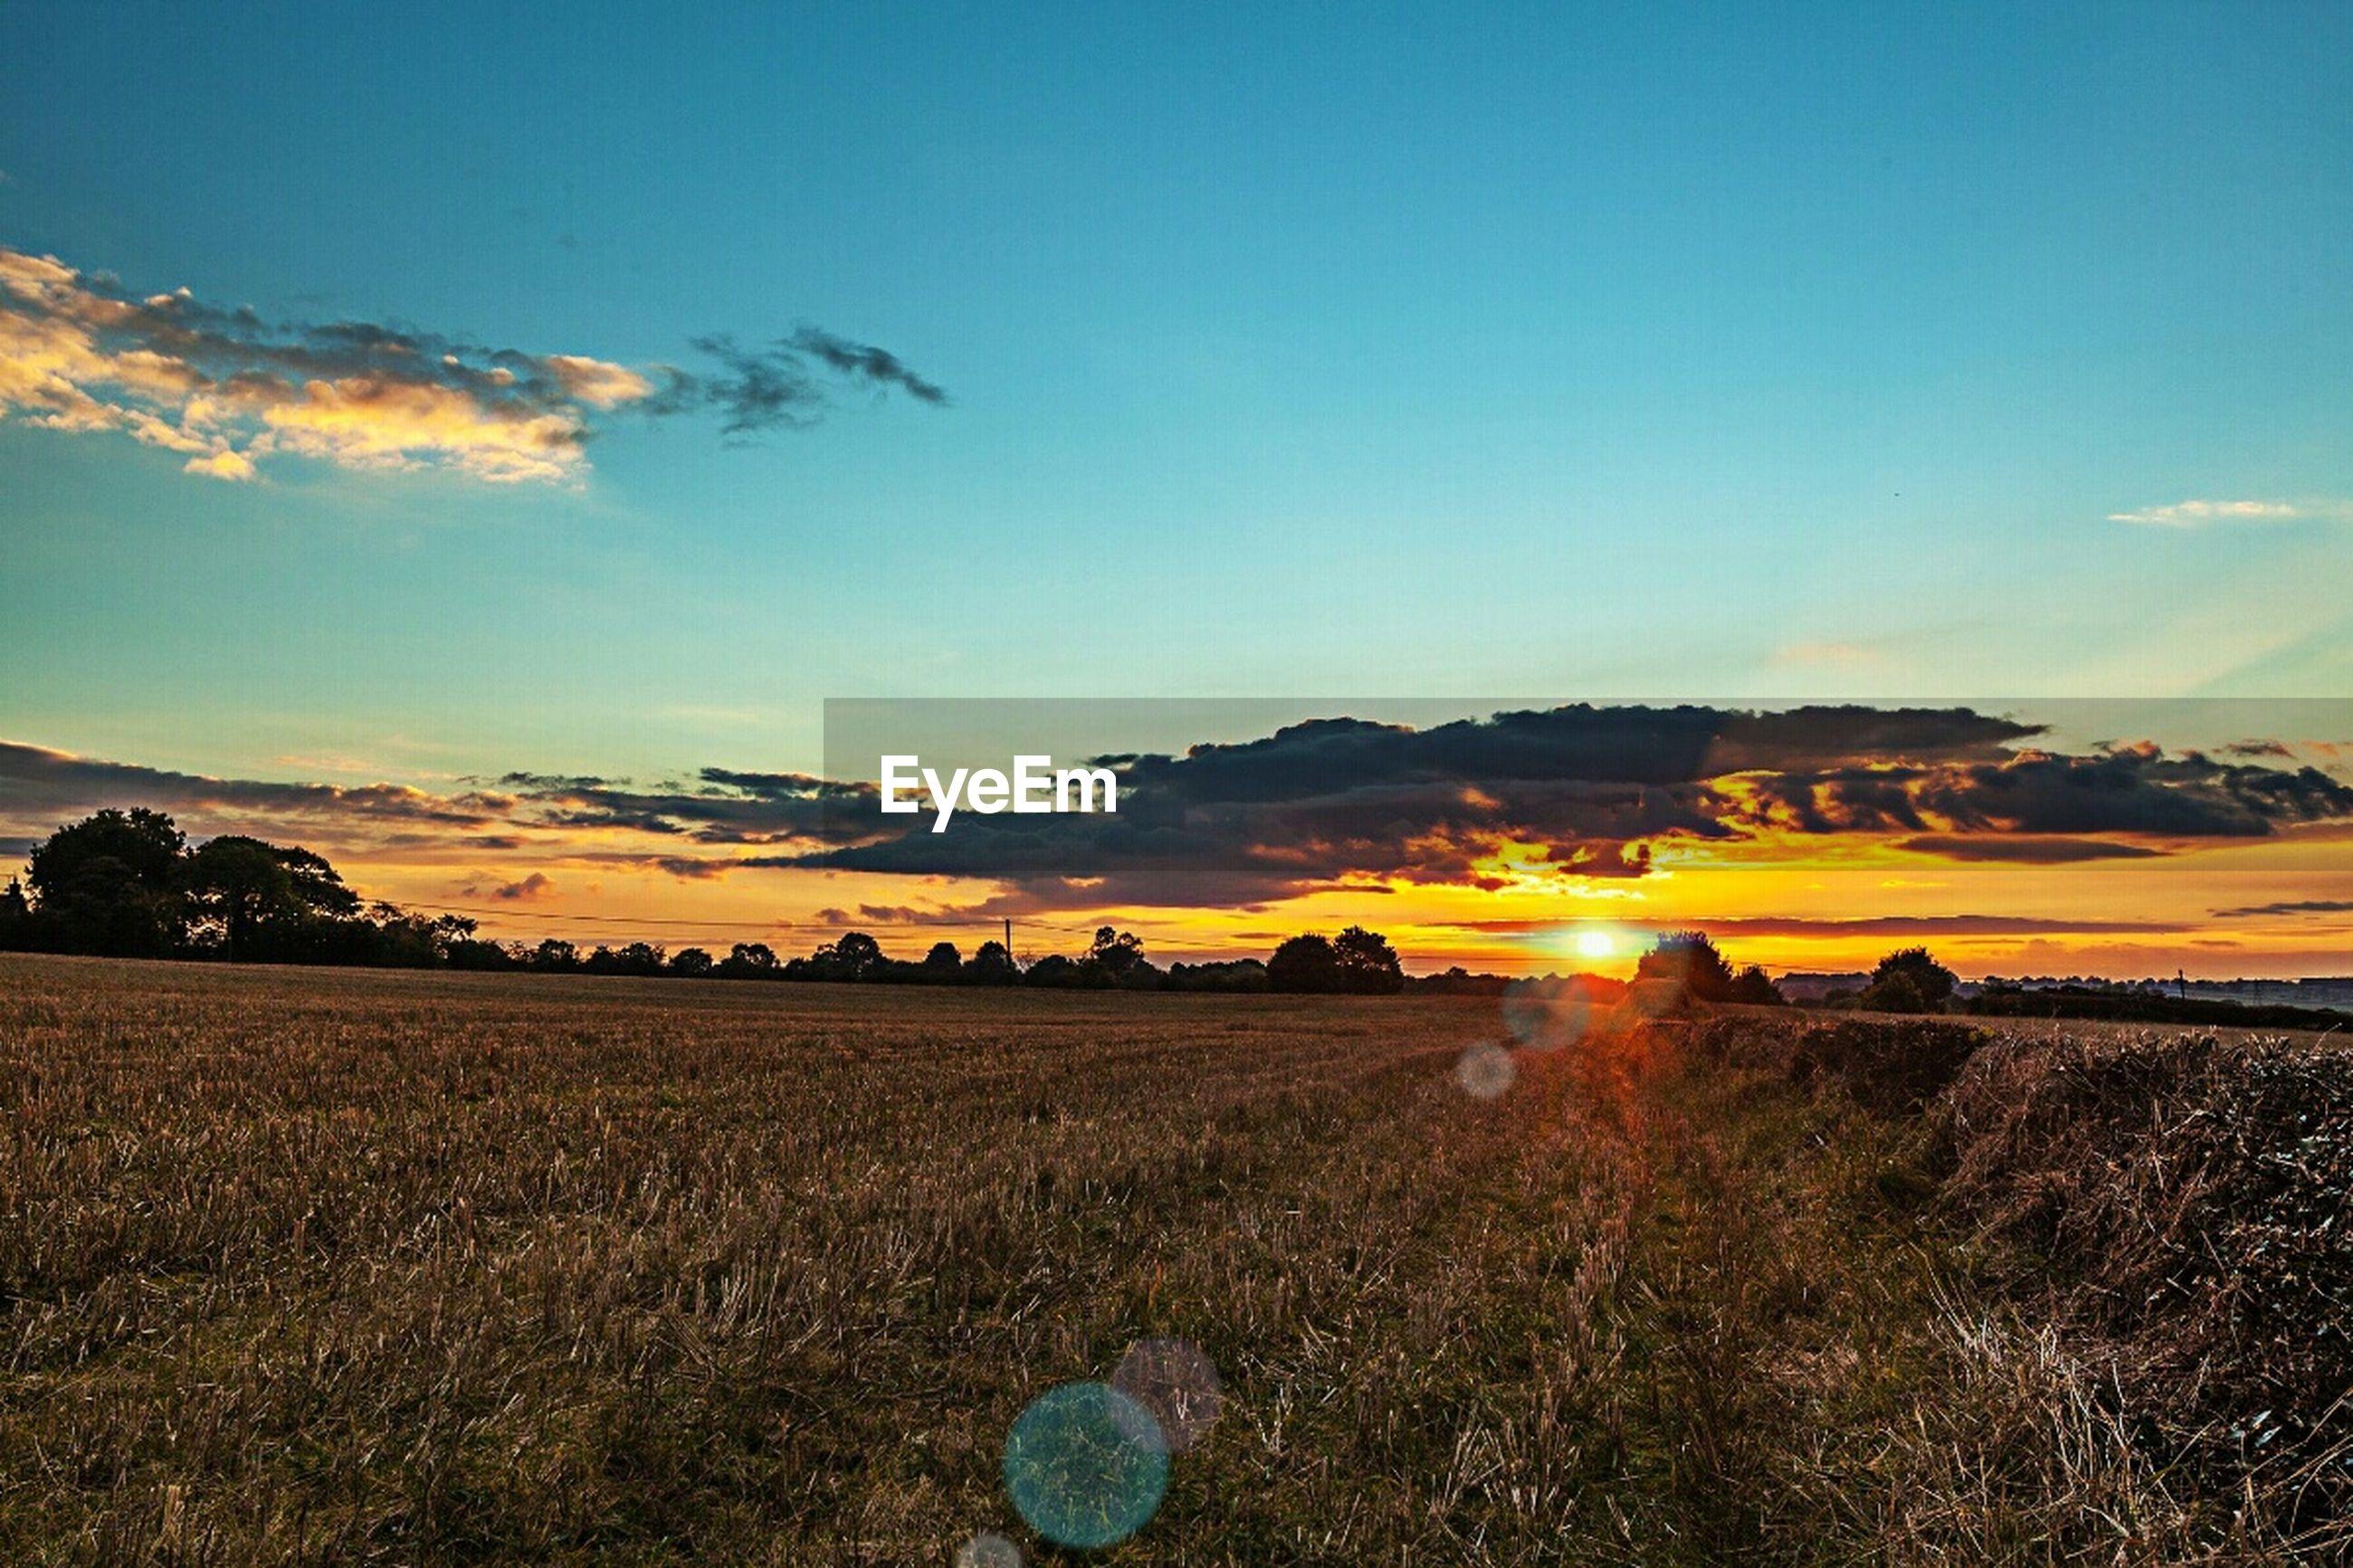 landscape, tranquil scene, scenics, tranquility, sunset, sky, beauty in nature, field, nature, blue, idyllic, mountain, non-urban scene, rural scene, copy space, horizon over land, remote, grass, sunlight, cloud - sky